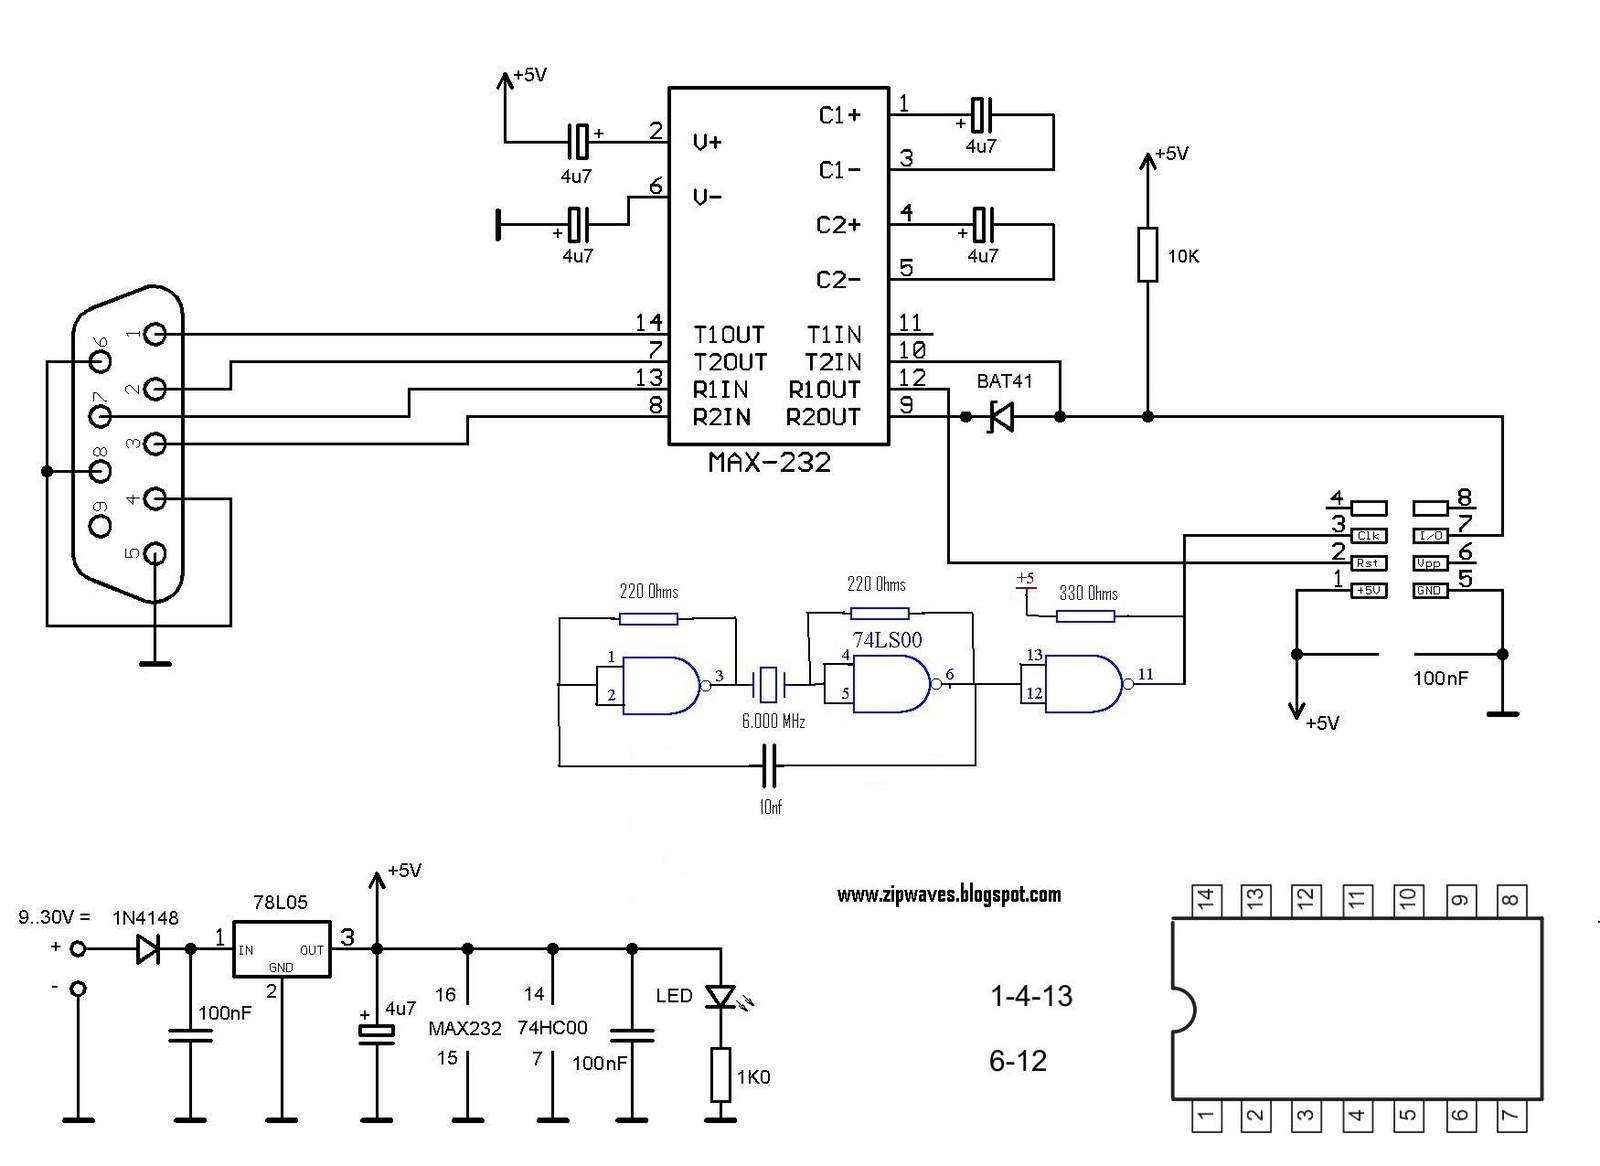 medium resolution of smart card wiring diagram wiring diagram g9 smart card wiring diagram